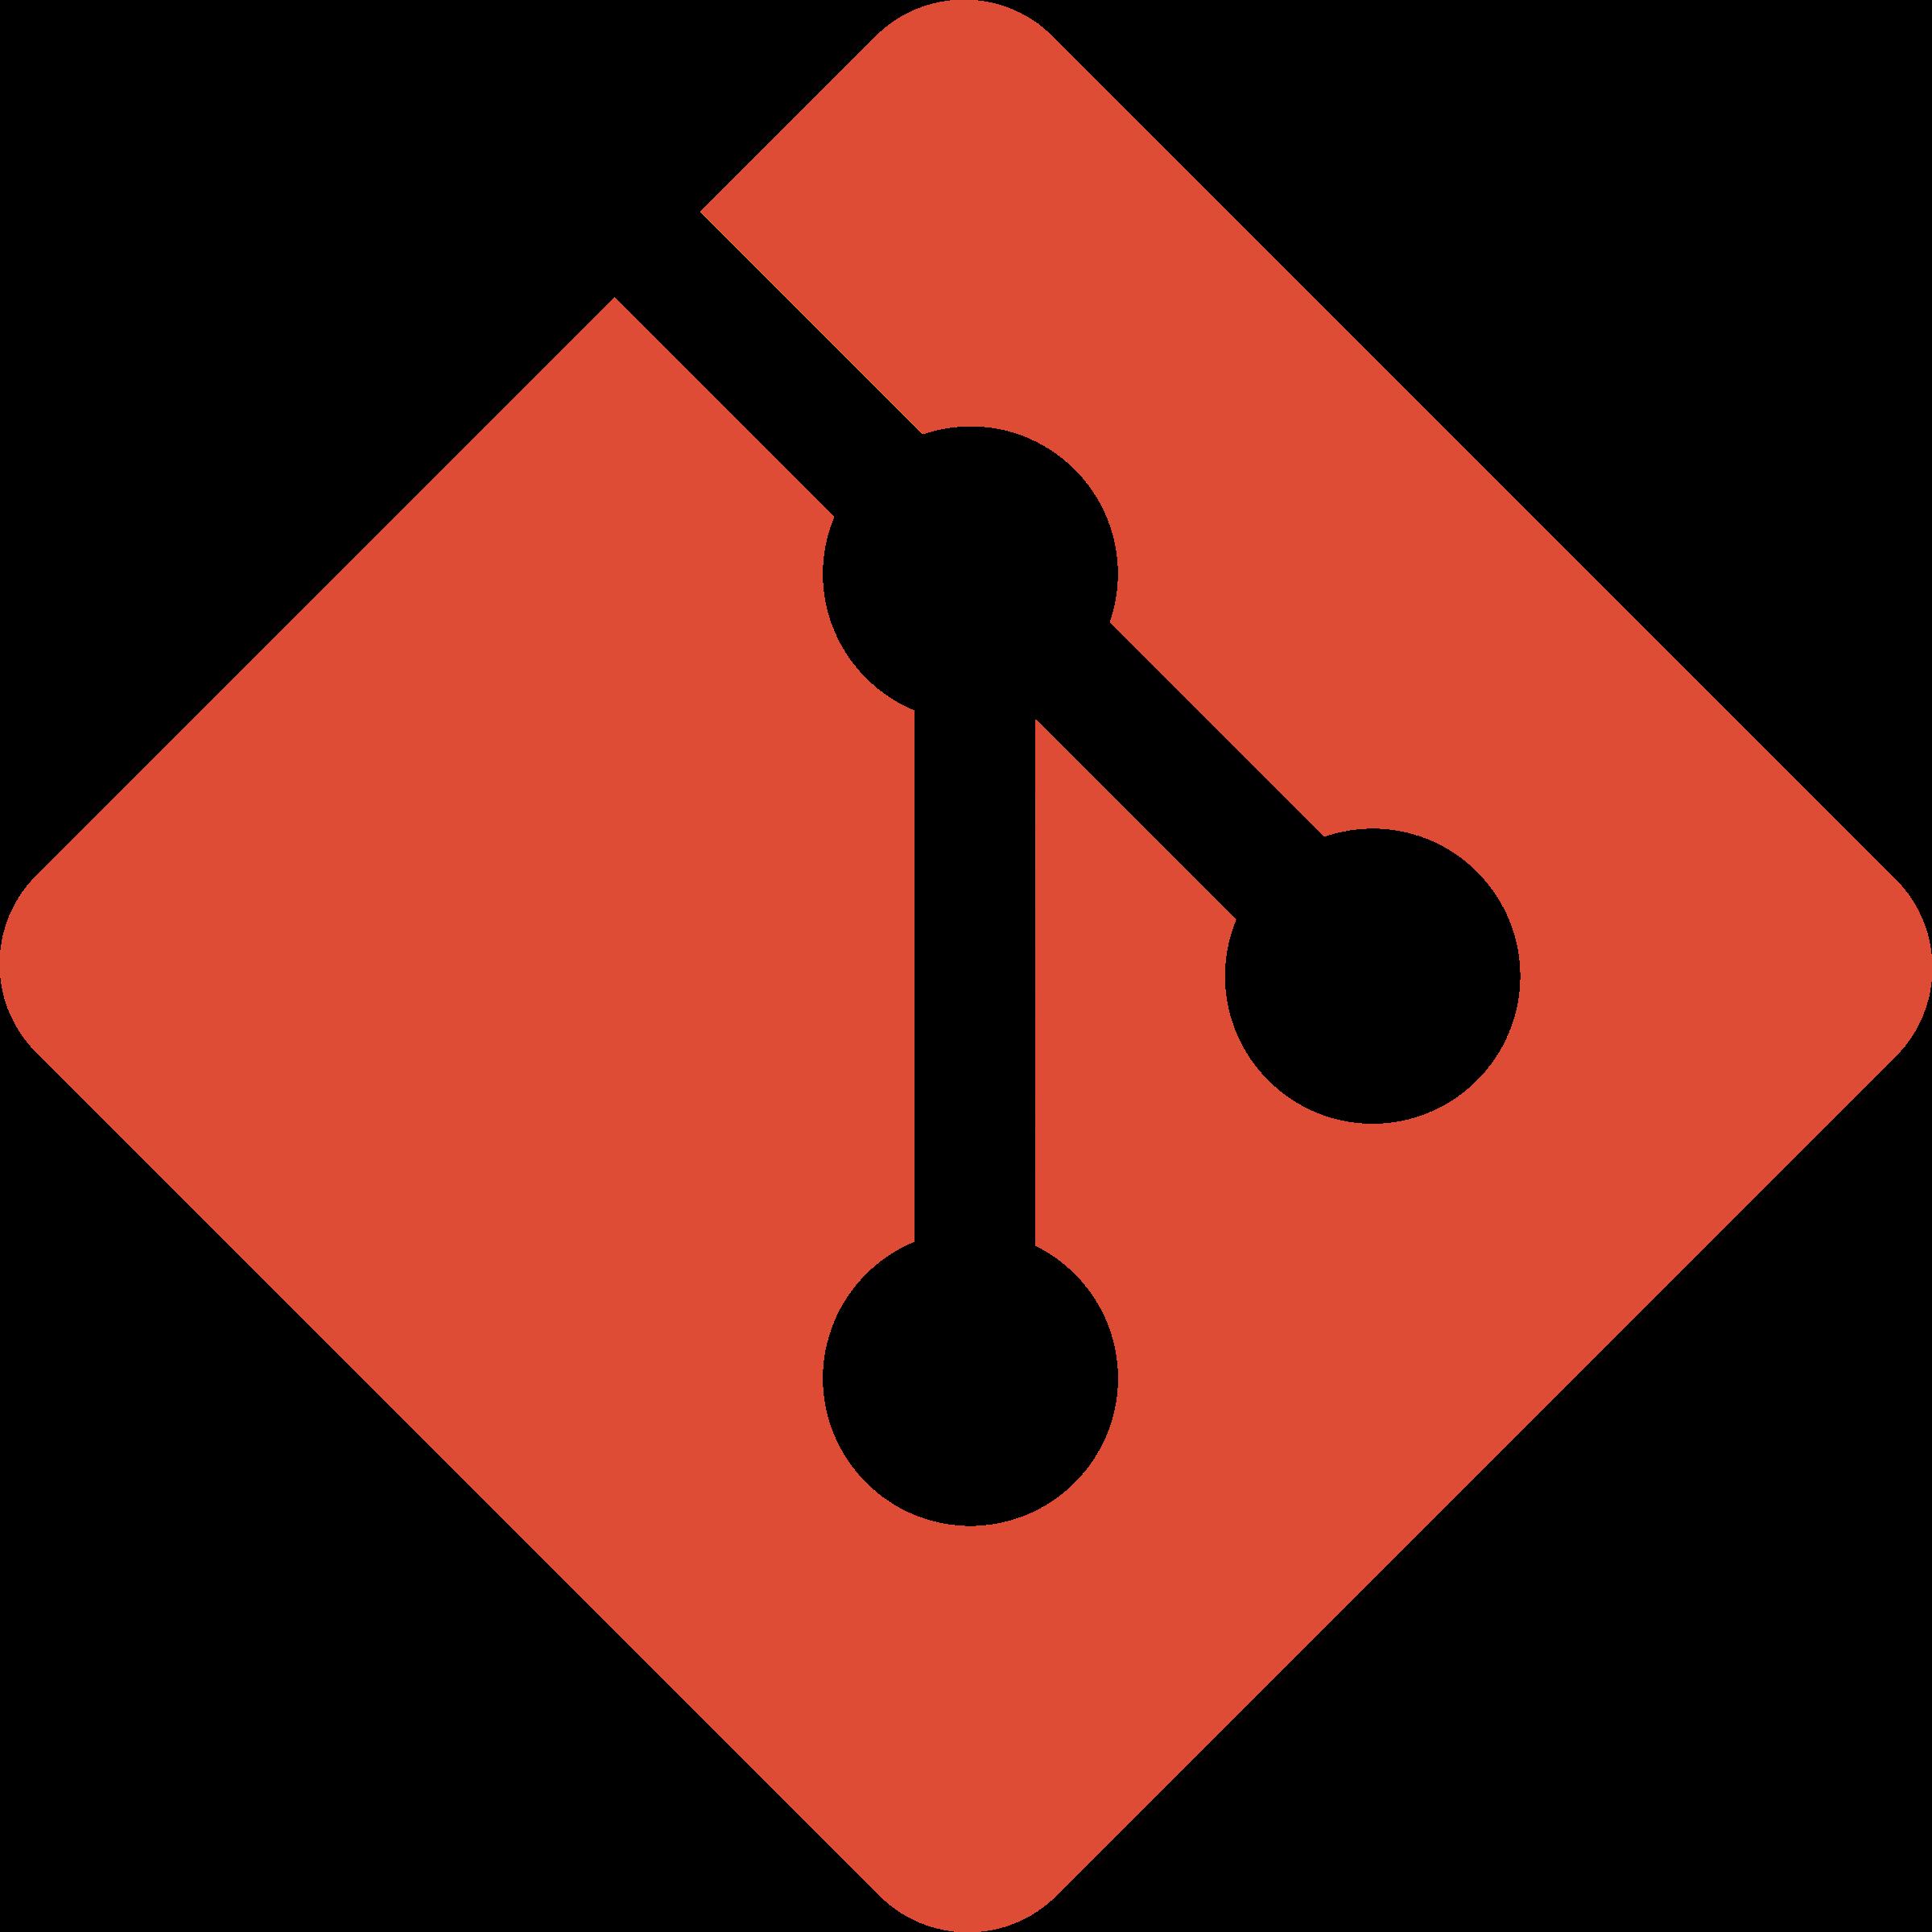 https://cdn.freebiesupply.com/logos/large/2x/git-icon-logo-png-transparent.png